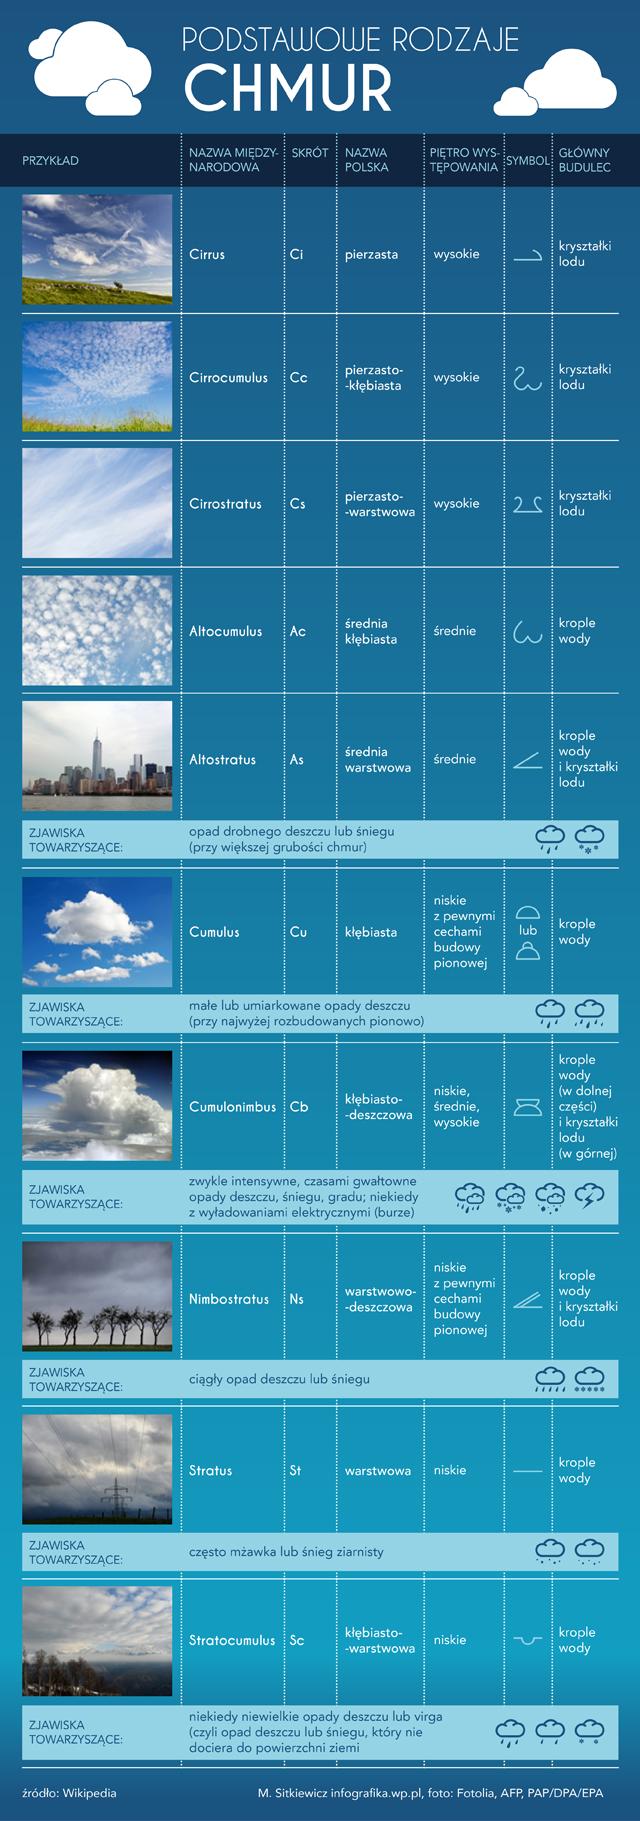 http://i.wp.pl/a/f/jpeg/33089/chmury_rodzaje_infografika.jpeg